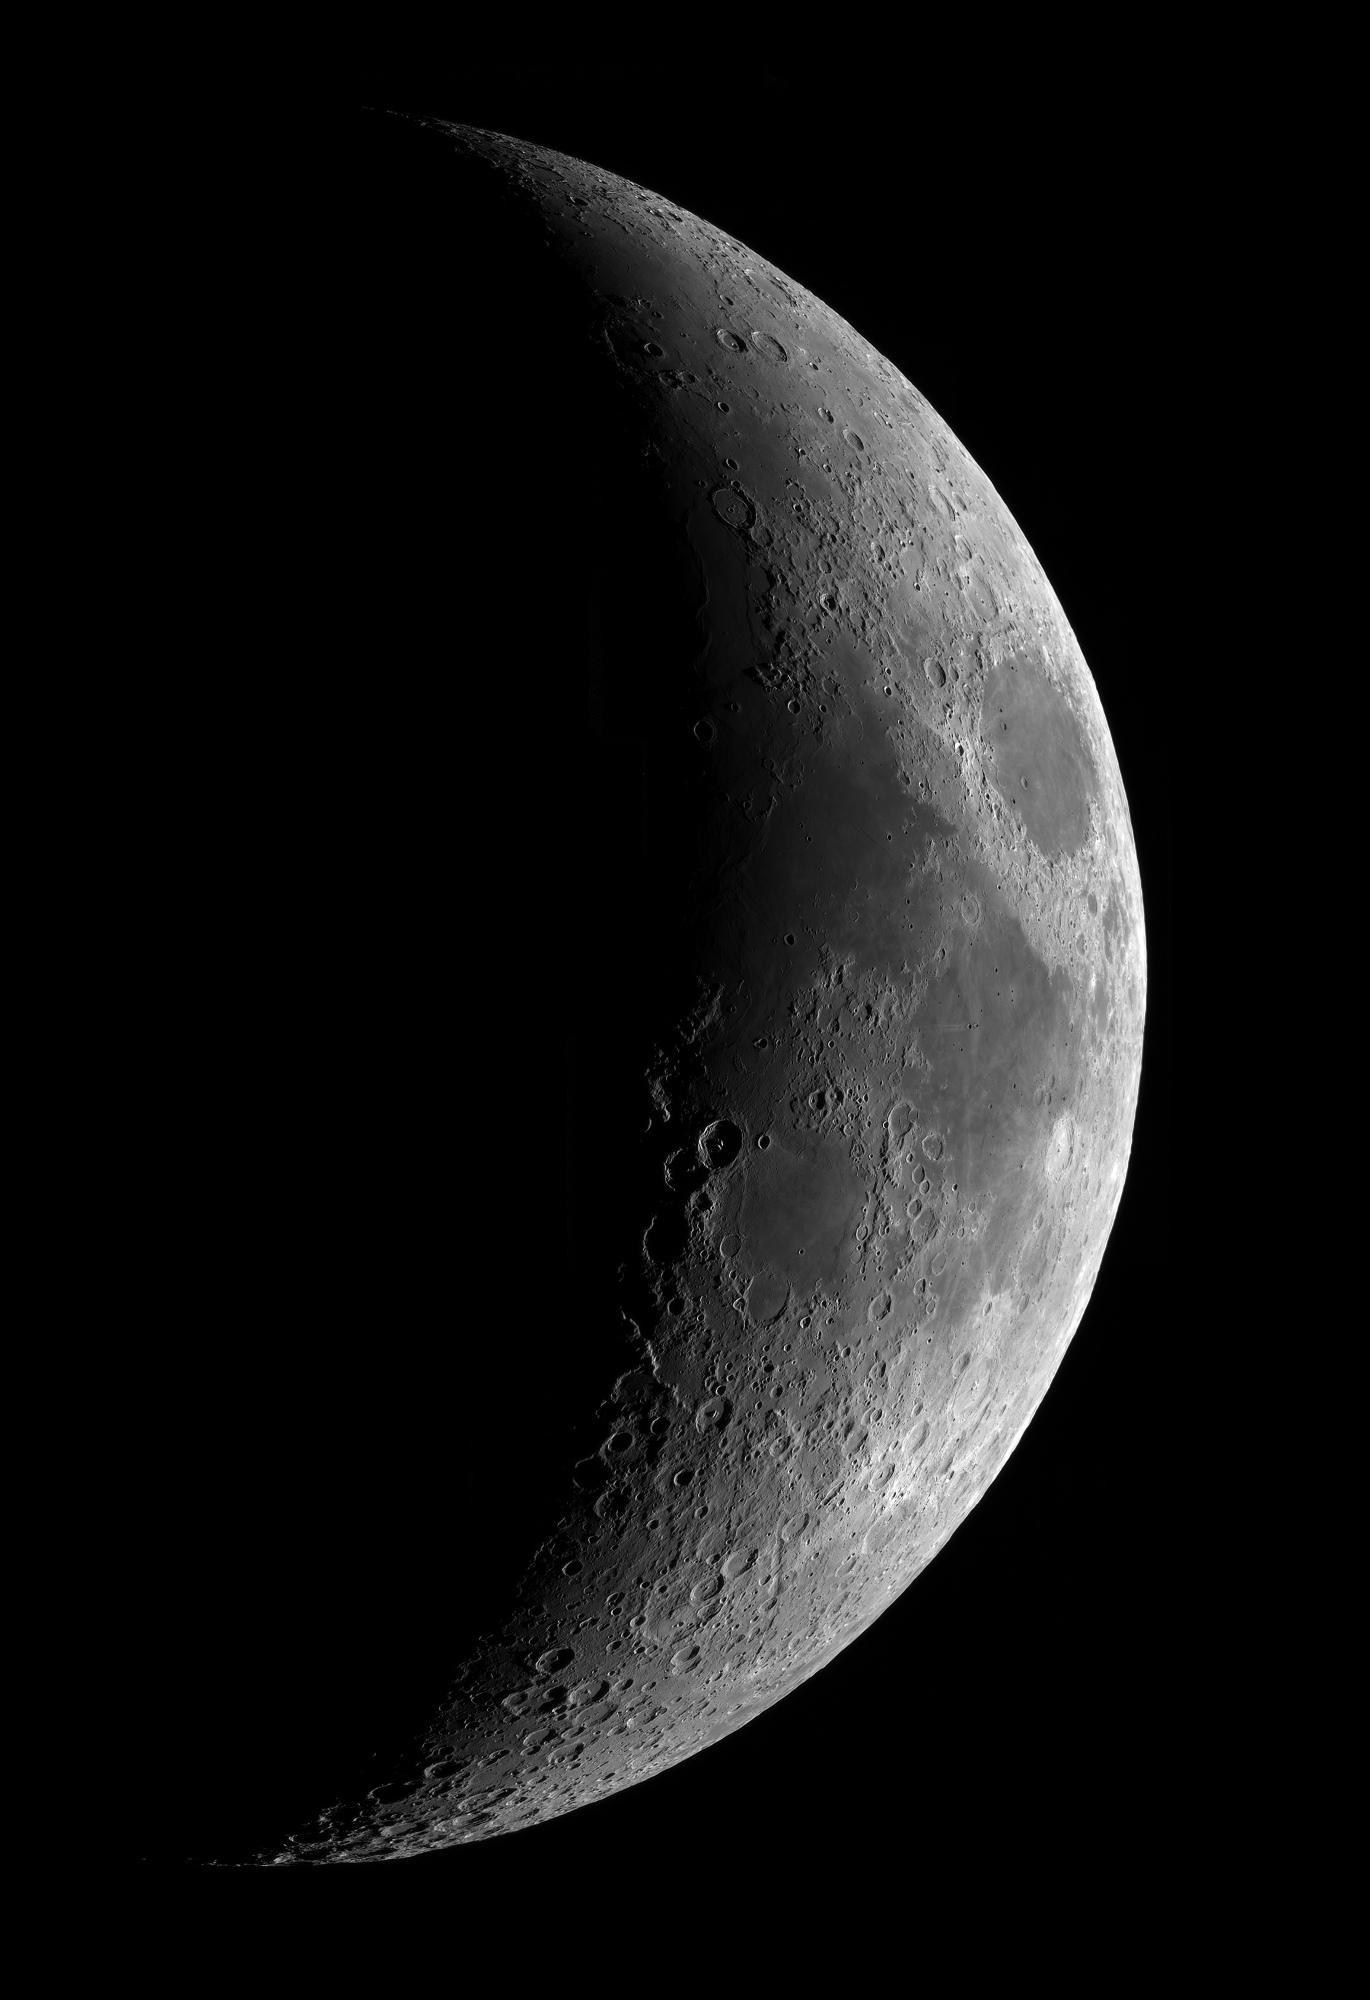 5ed1654526fa3_lune270520(C8-Foyer-100)NetB.thumb.jpg.b44409ca05fc22f2bcb37a1bb89fe838.jpg